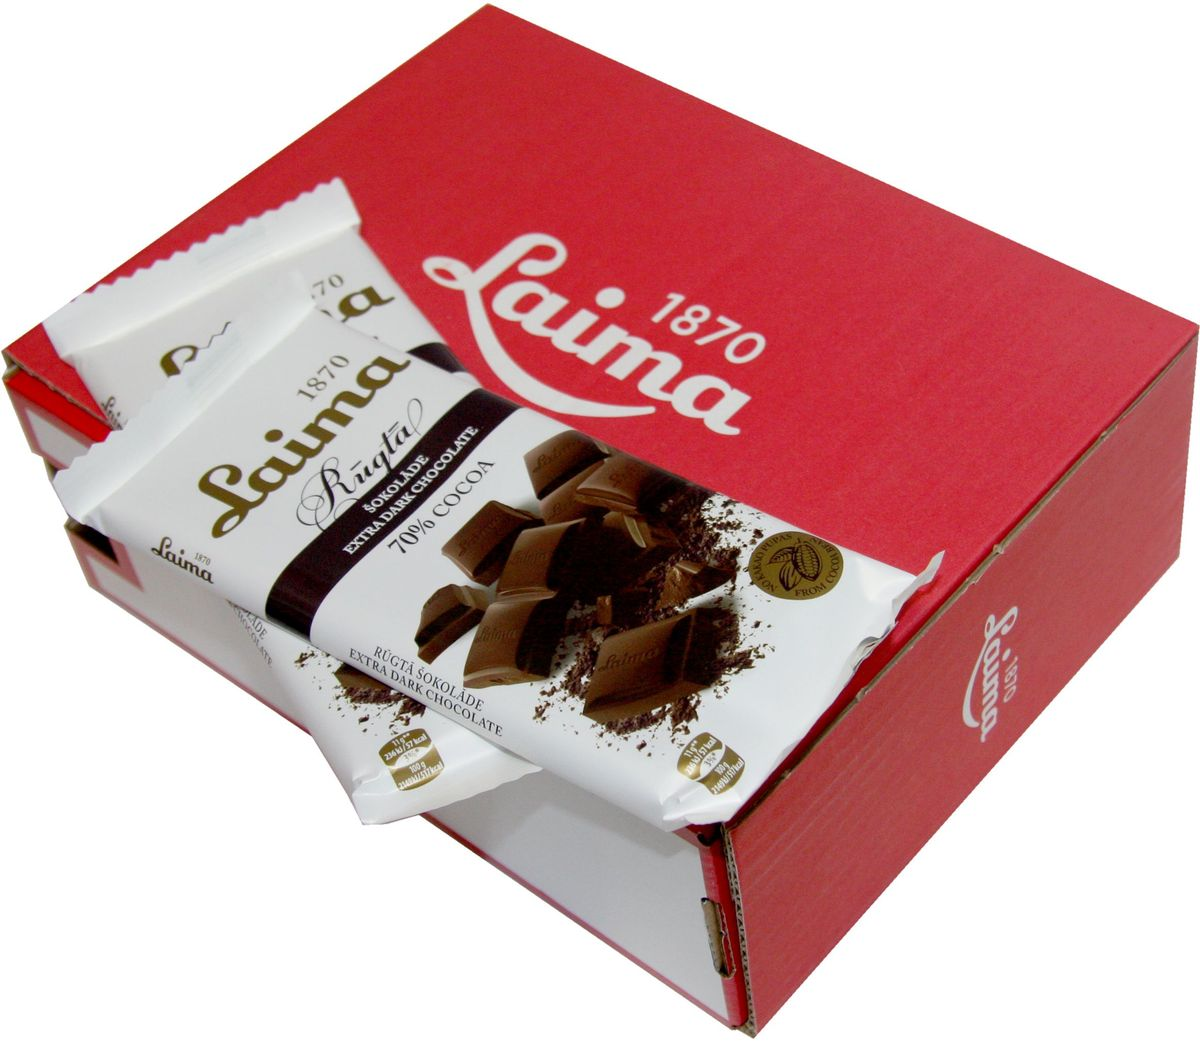 Laima Горький шоколад 70%, 100 г шоколад горький 77% какао блэкминт